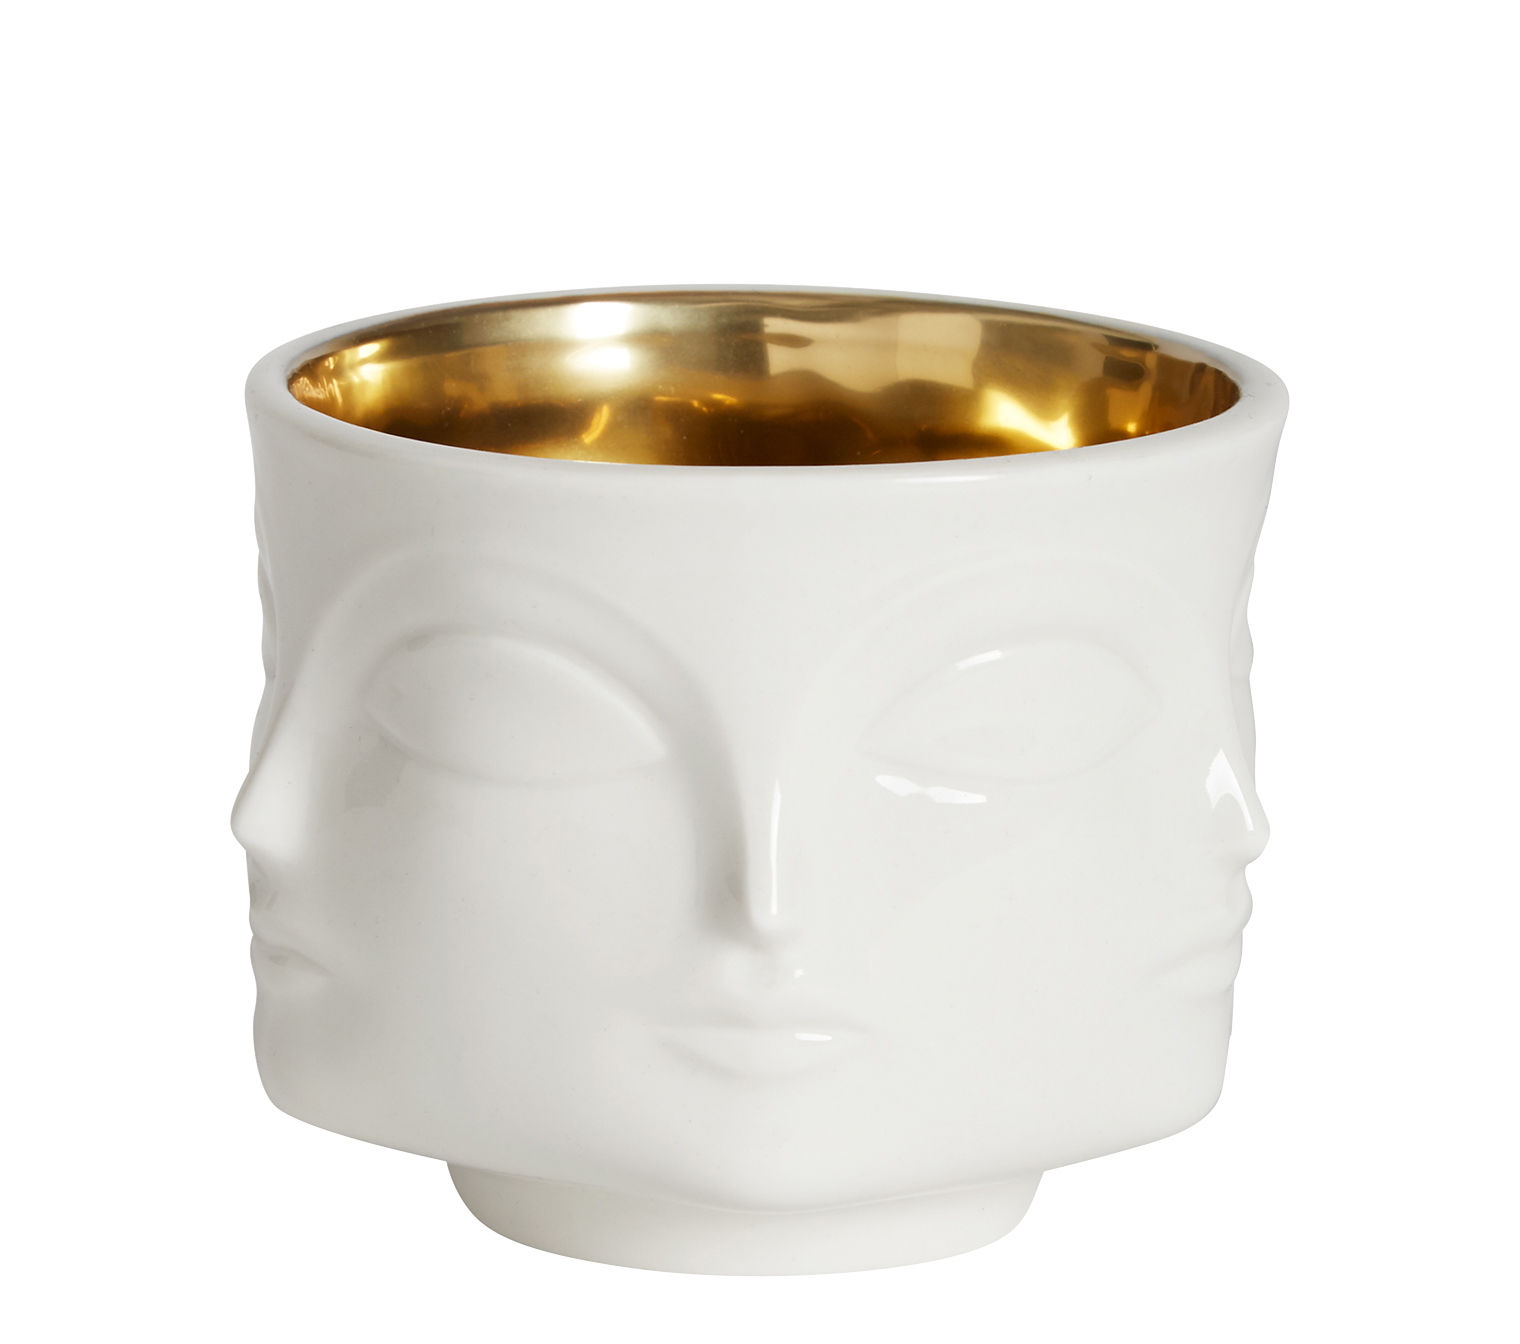 Decoration - Vases - Muse Vase by Jonathan Adler - White & gold - China, Gold